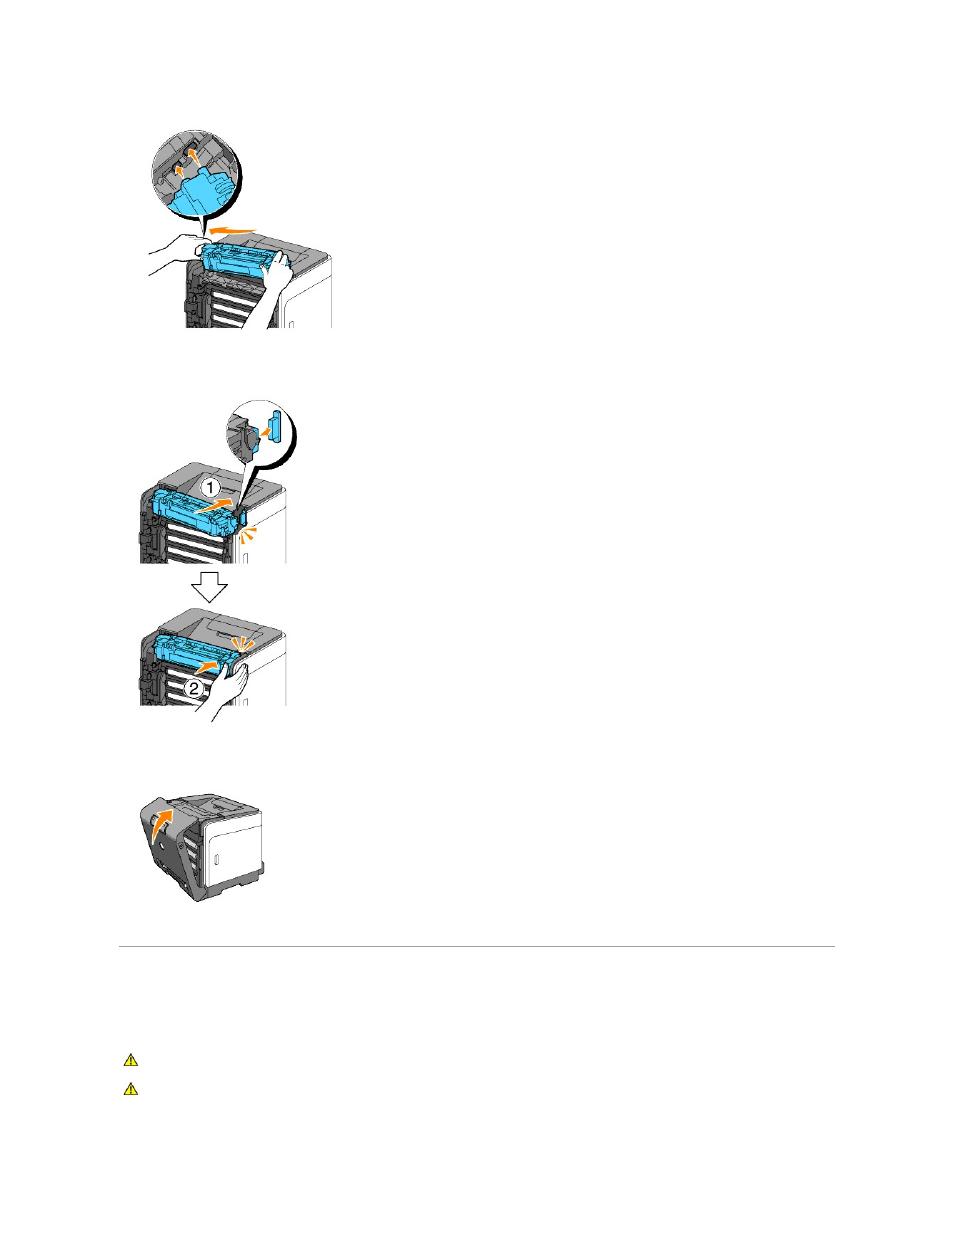 Replacing separator roller   Dell 1320c Network Color Laser Printer User  Manual   Page 111 /